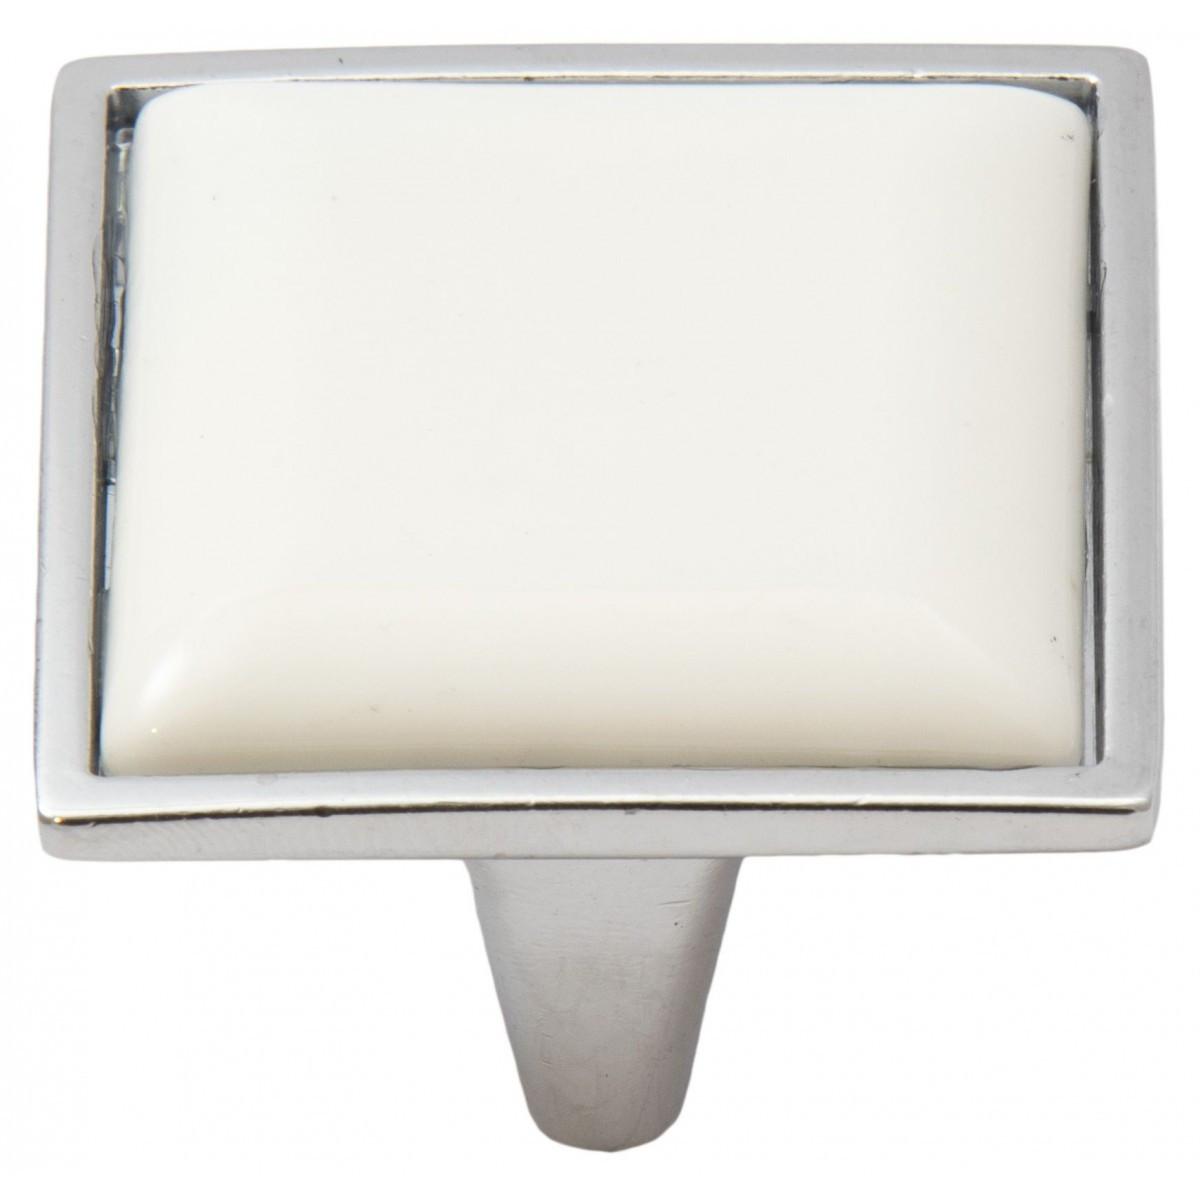 Ручка меблева Ozkardesler 5352-06/46 кераміка 32мм PORSELEN Хром